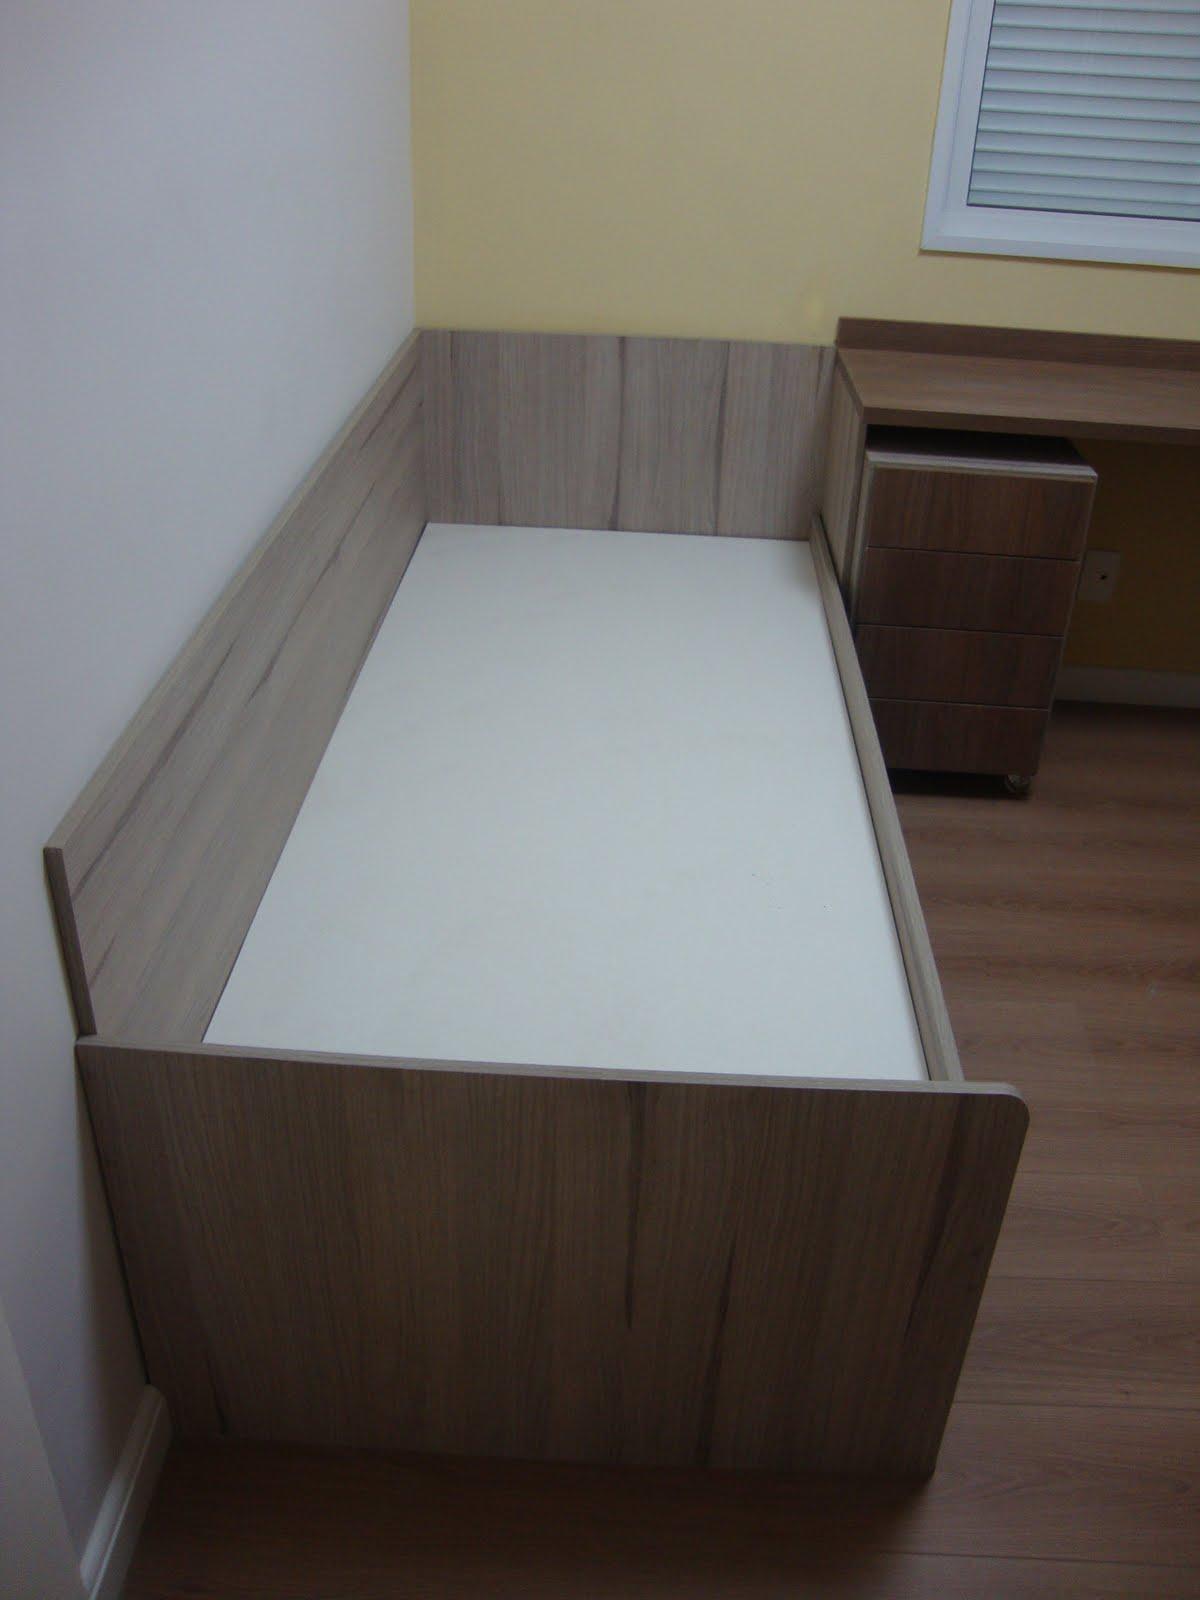 Sioli marcenaria apartamento completo for Divan cama completo